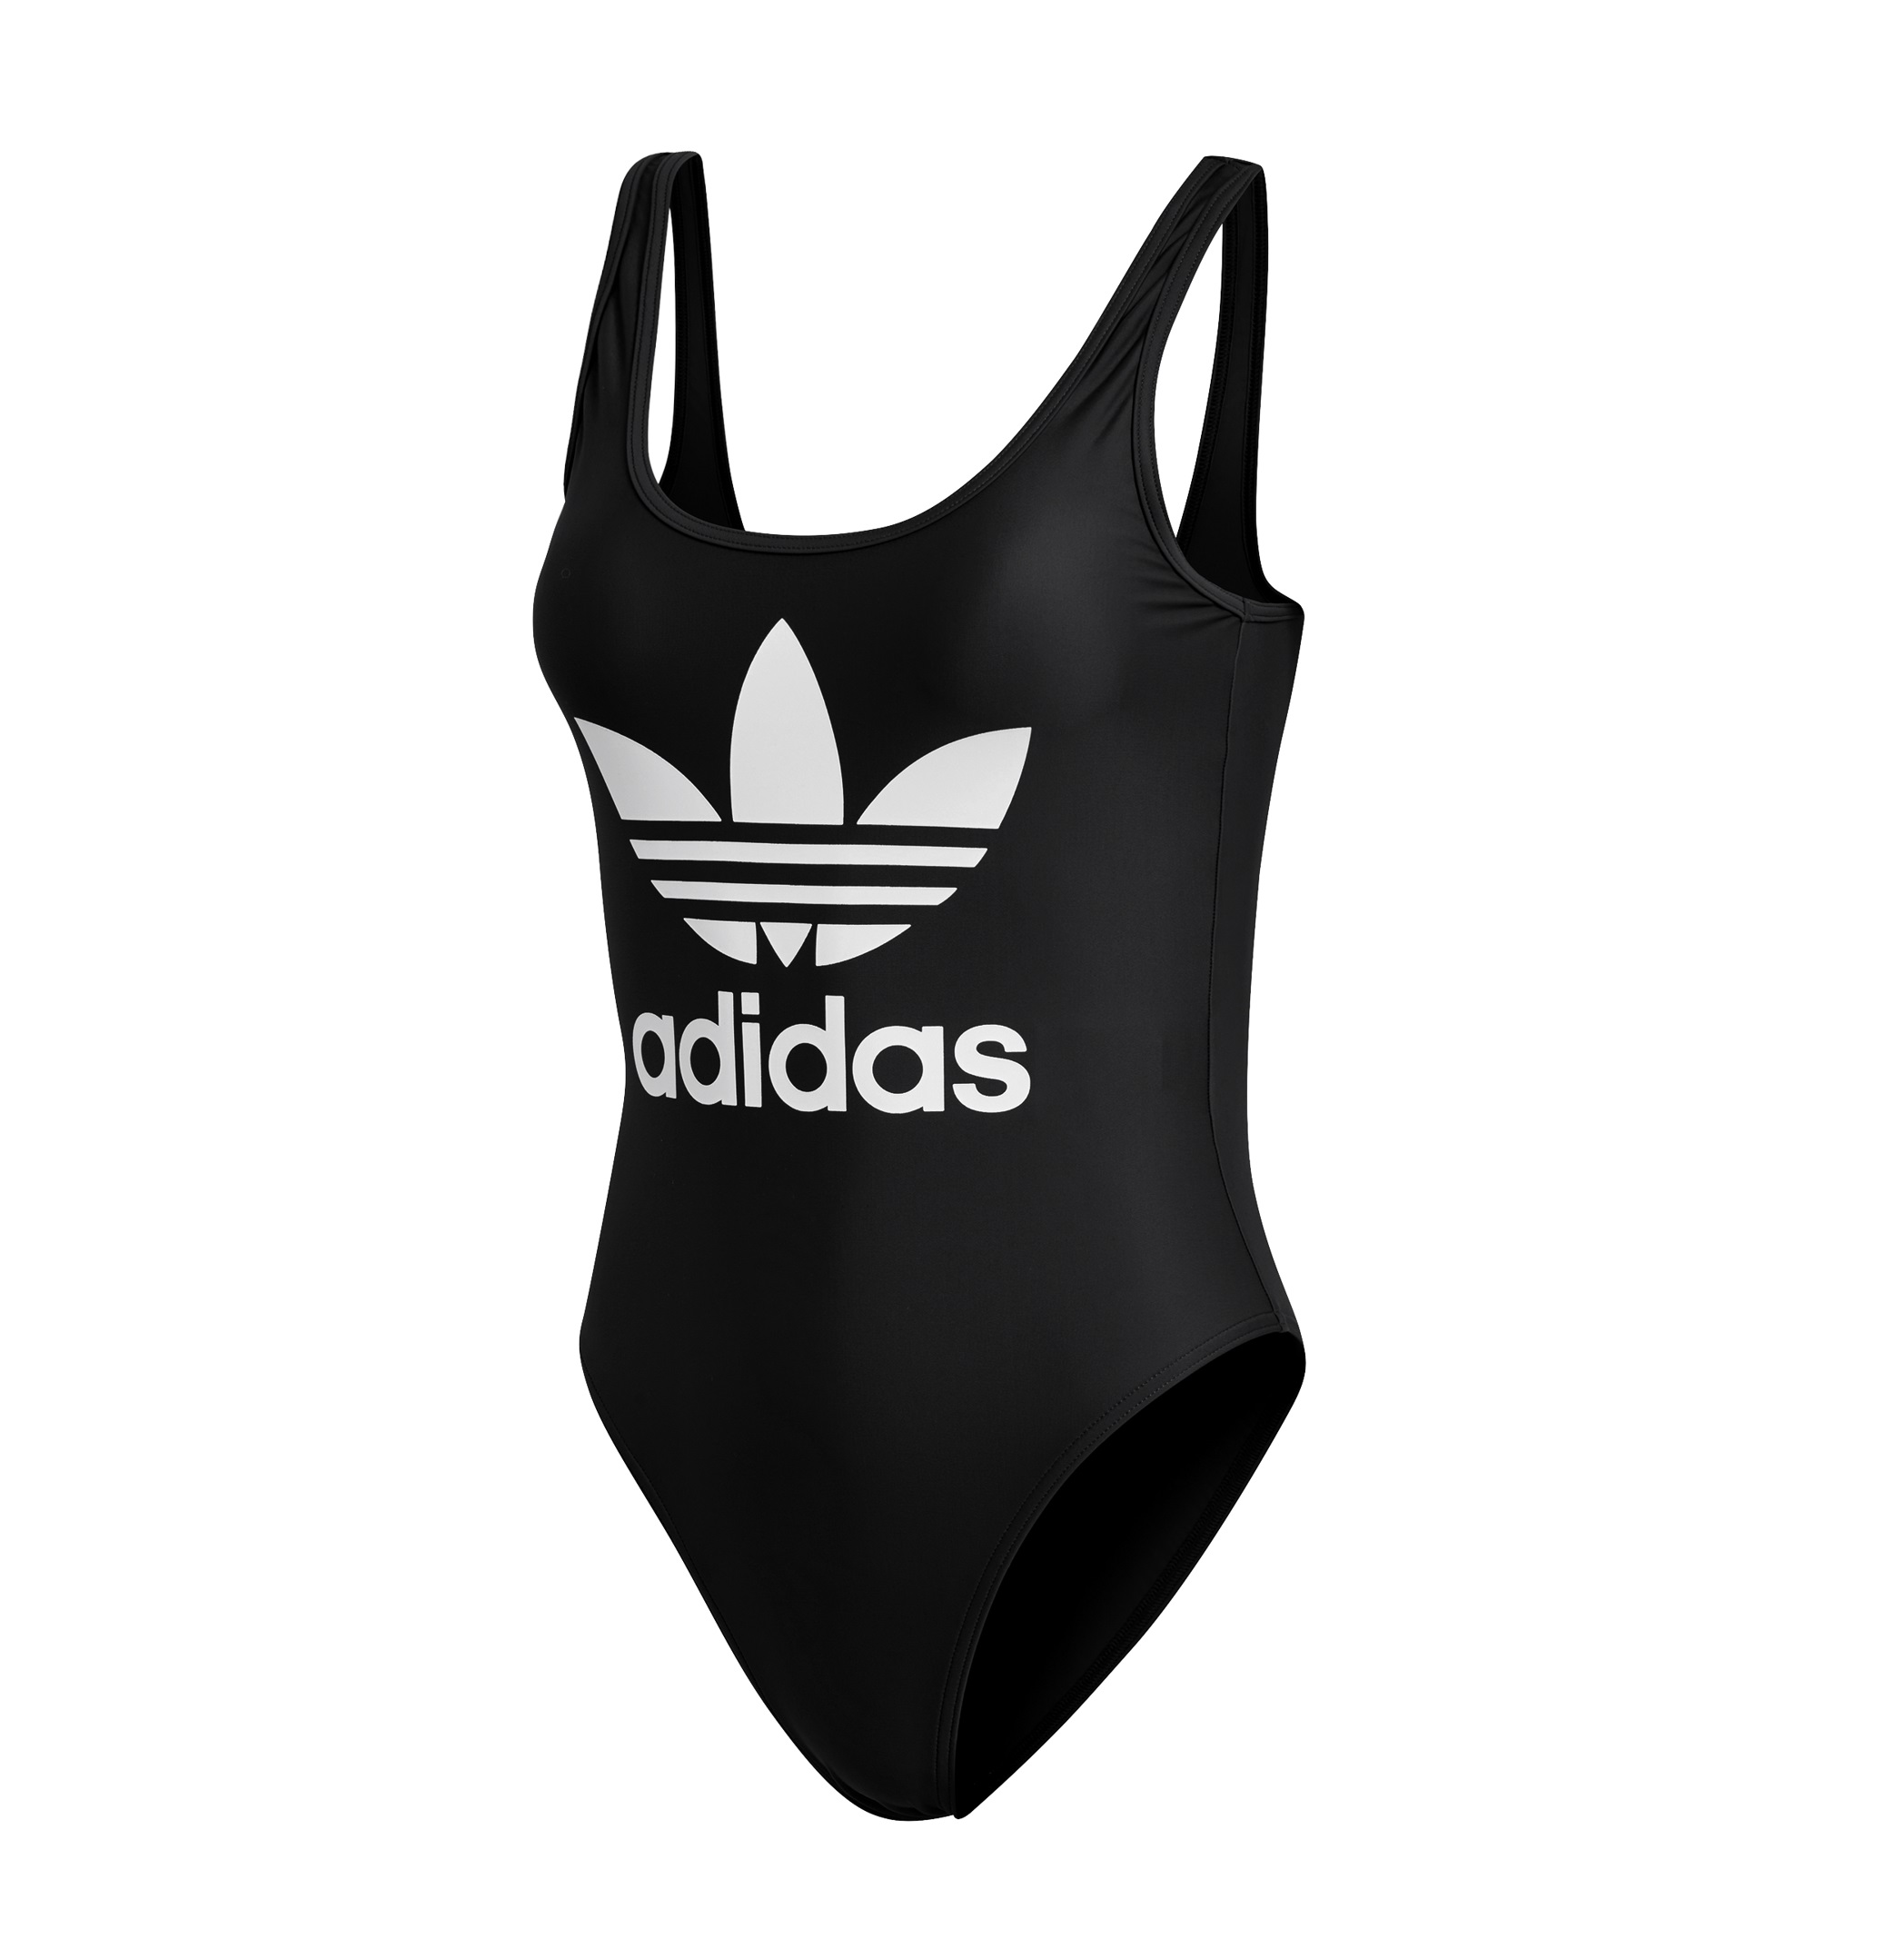 c37faff0114b46 strój kąpielowy adidas 3 Stripes Swimsuit DN8142 || timsport.pl ...